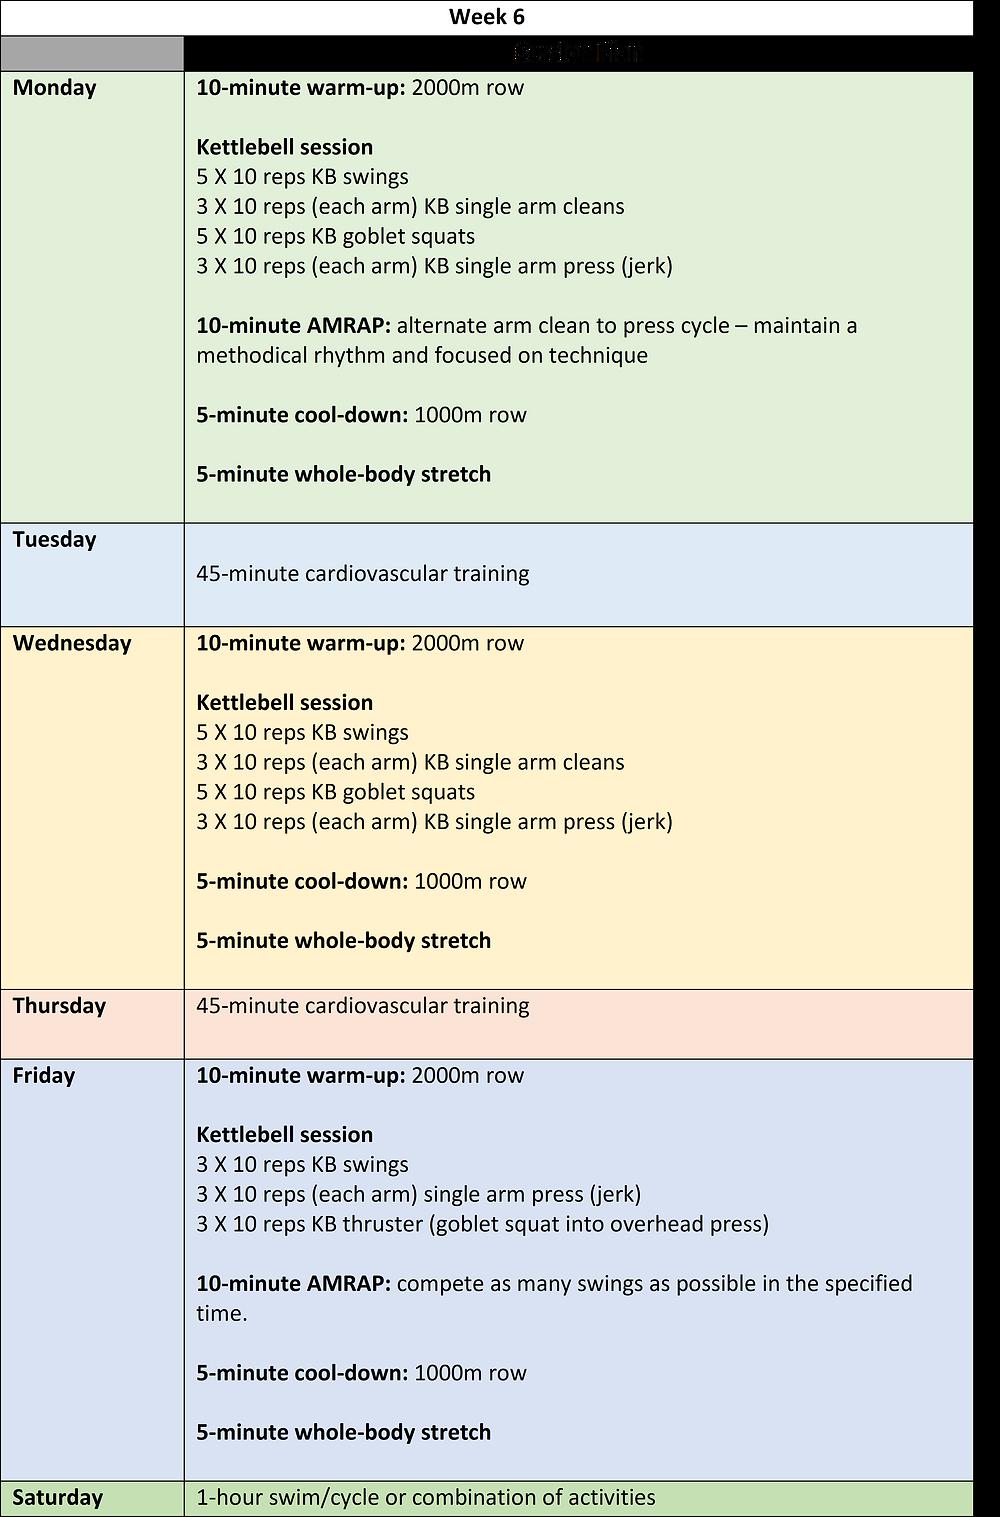 week 6 of a 6-week kettlebell training programme